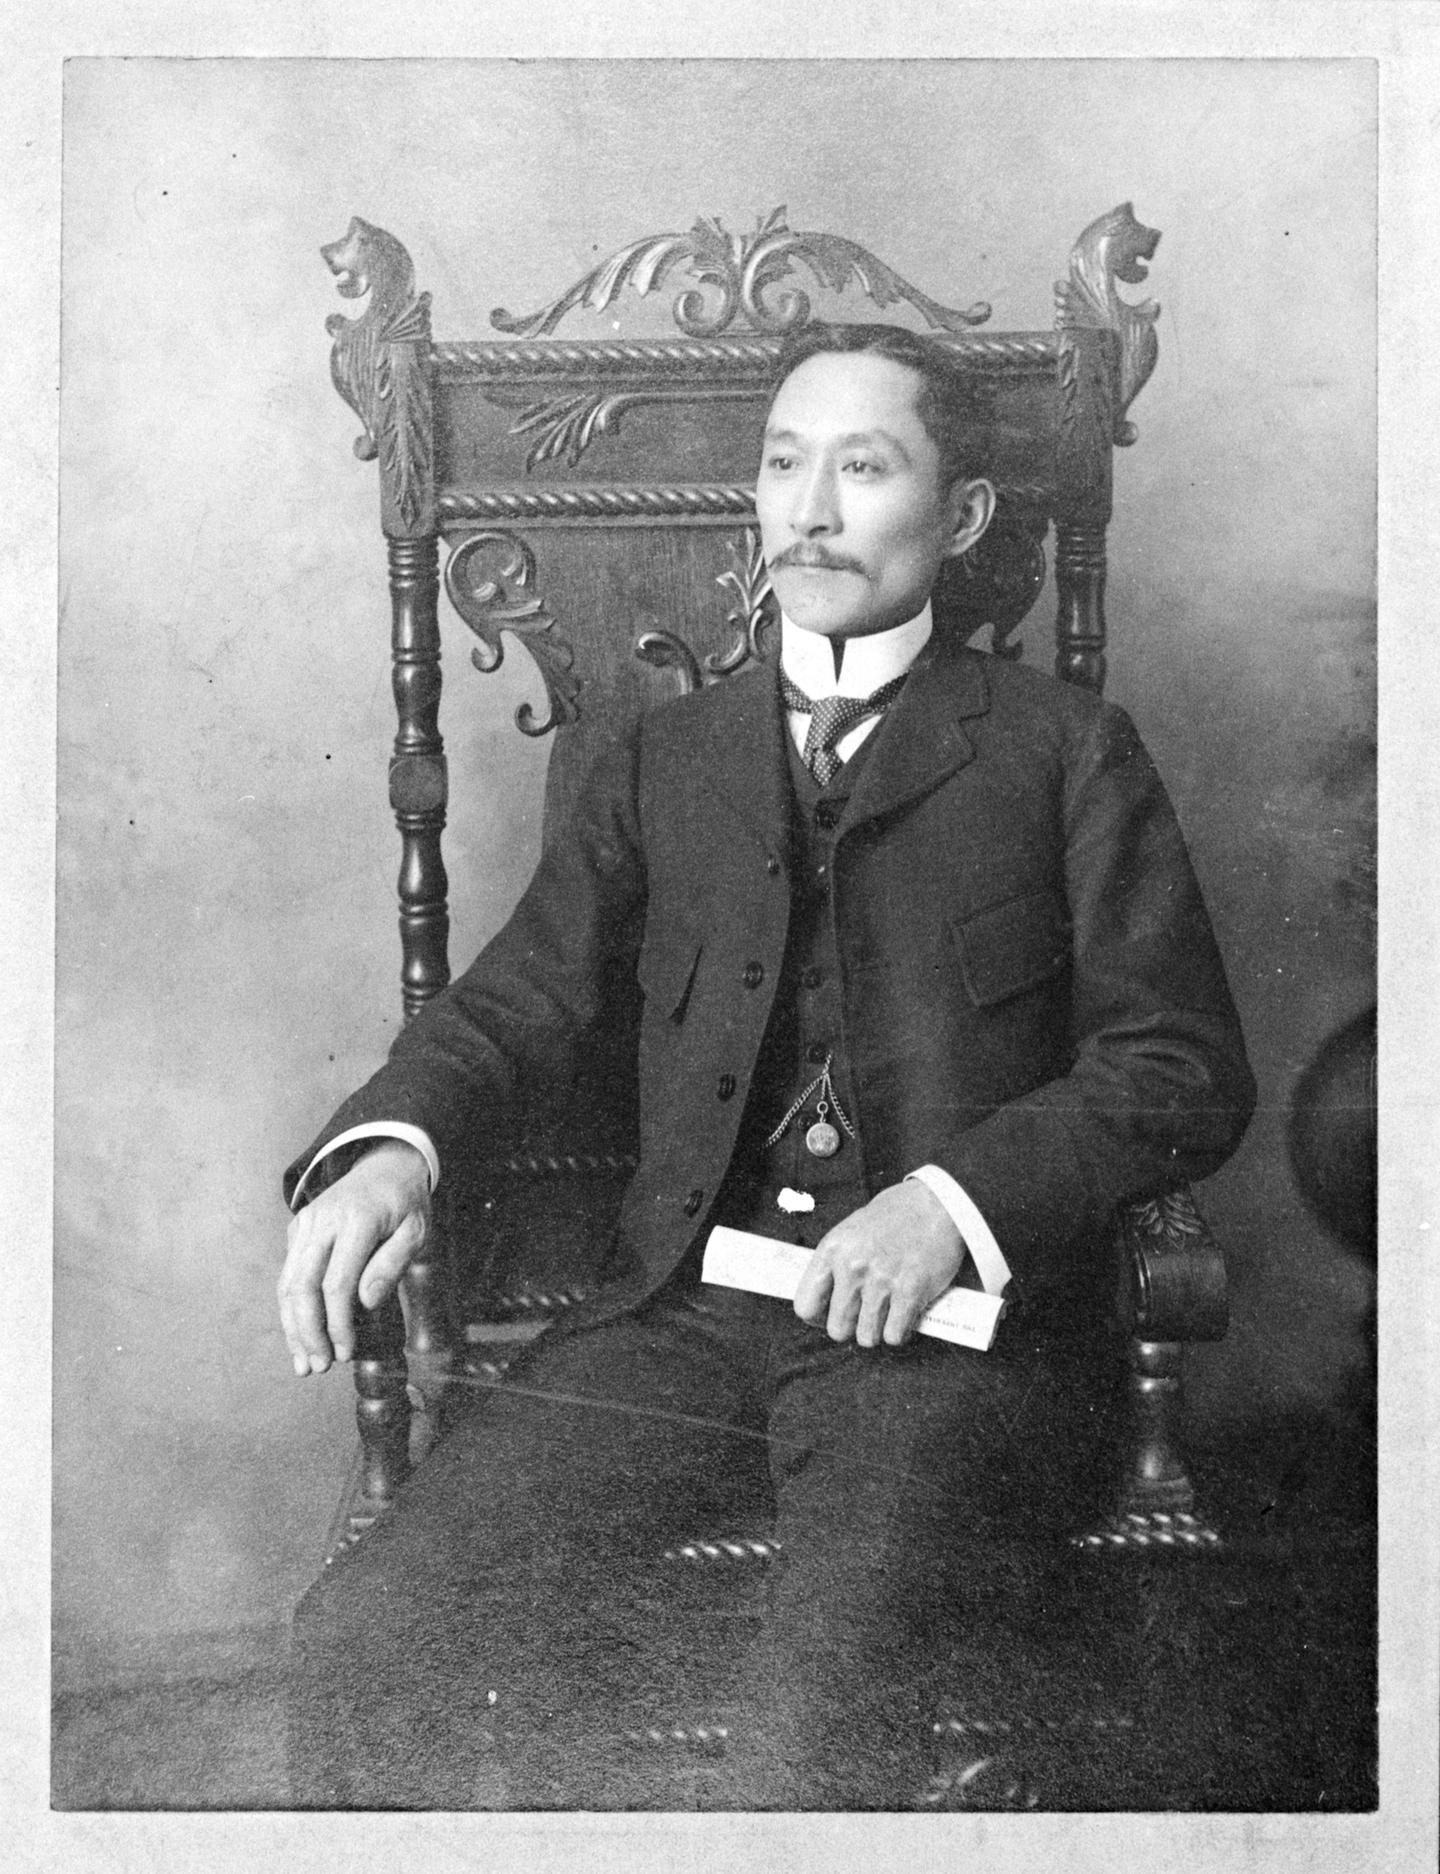 Photograph of Won Alexander Cumyow, circa 1900.